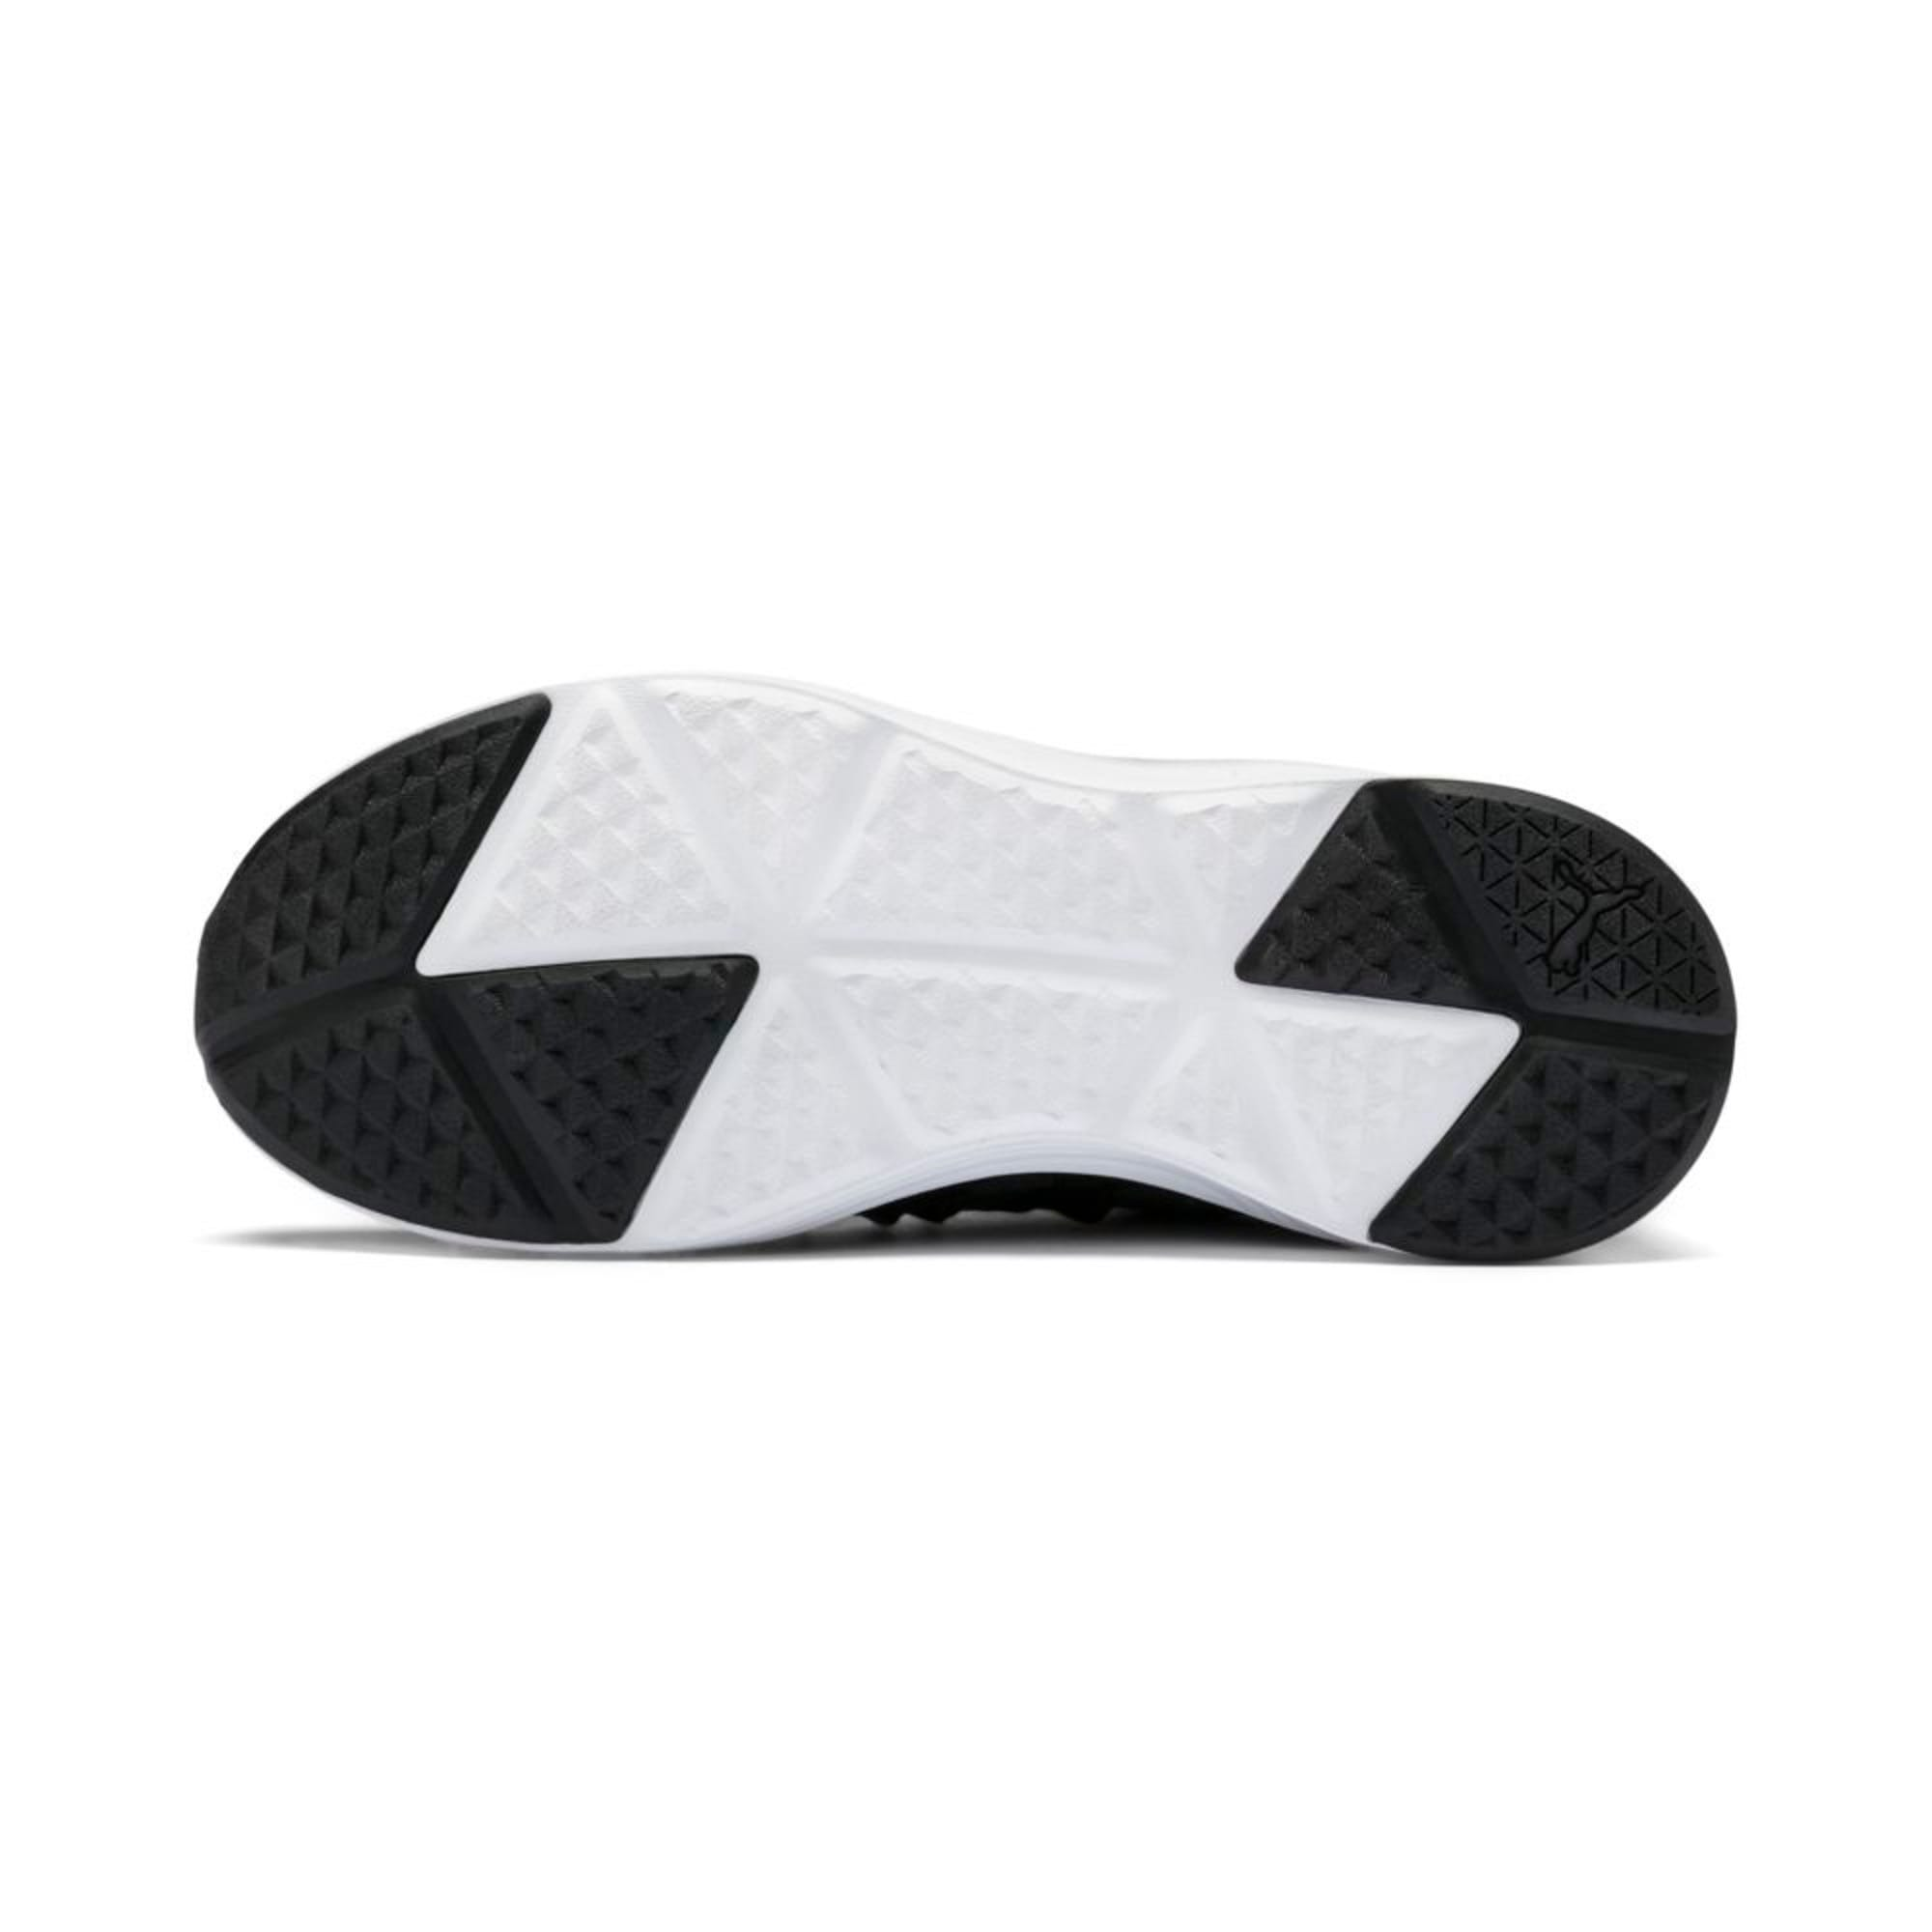 Thumbnail 2 of Prowl Alt Satin Women's Training Shoes, Puma Black-Puma White, medium-IND